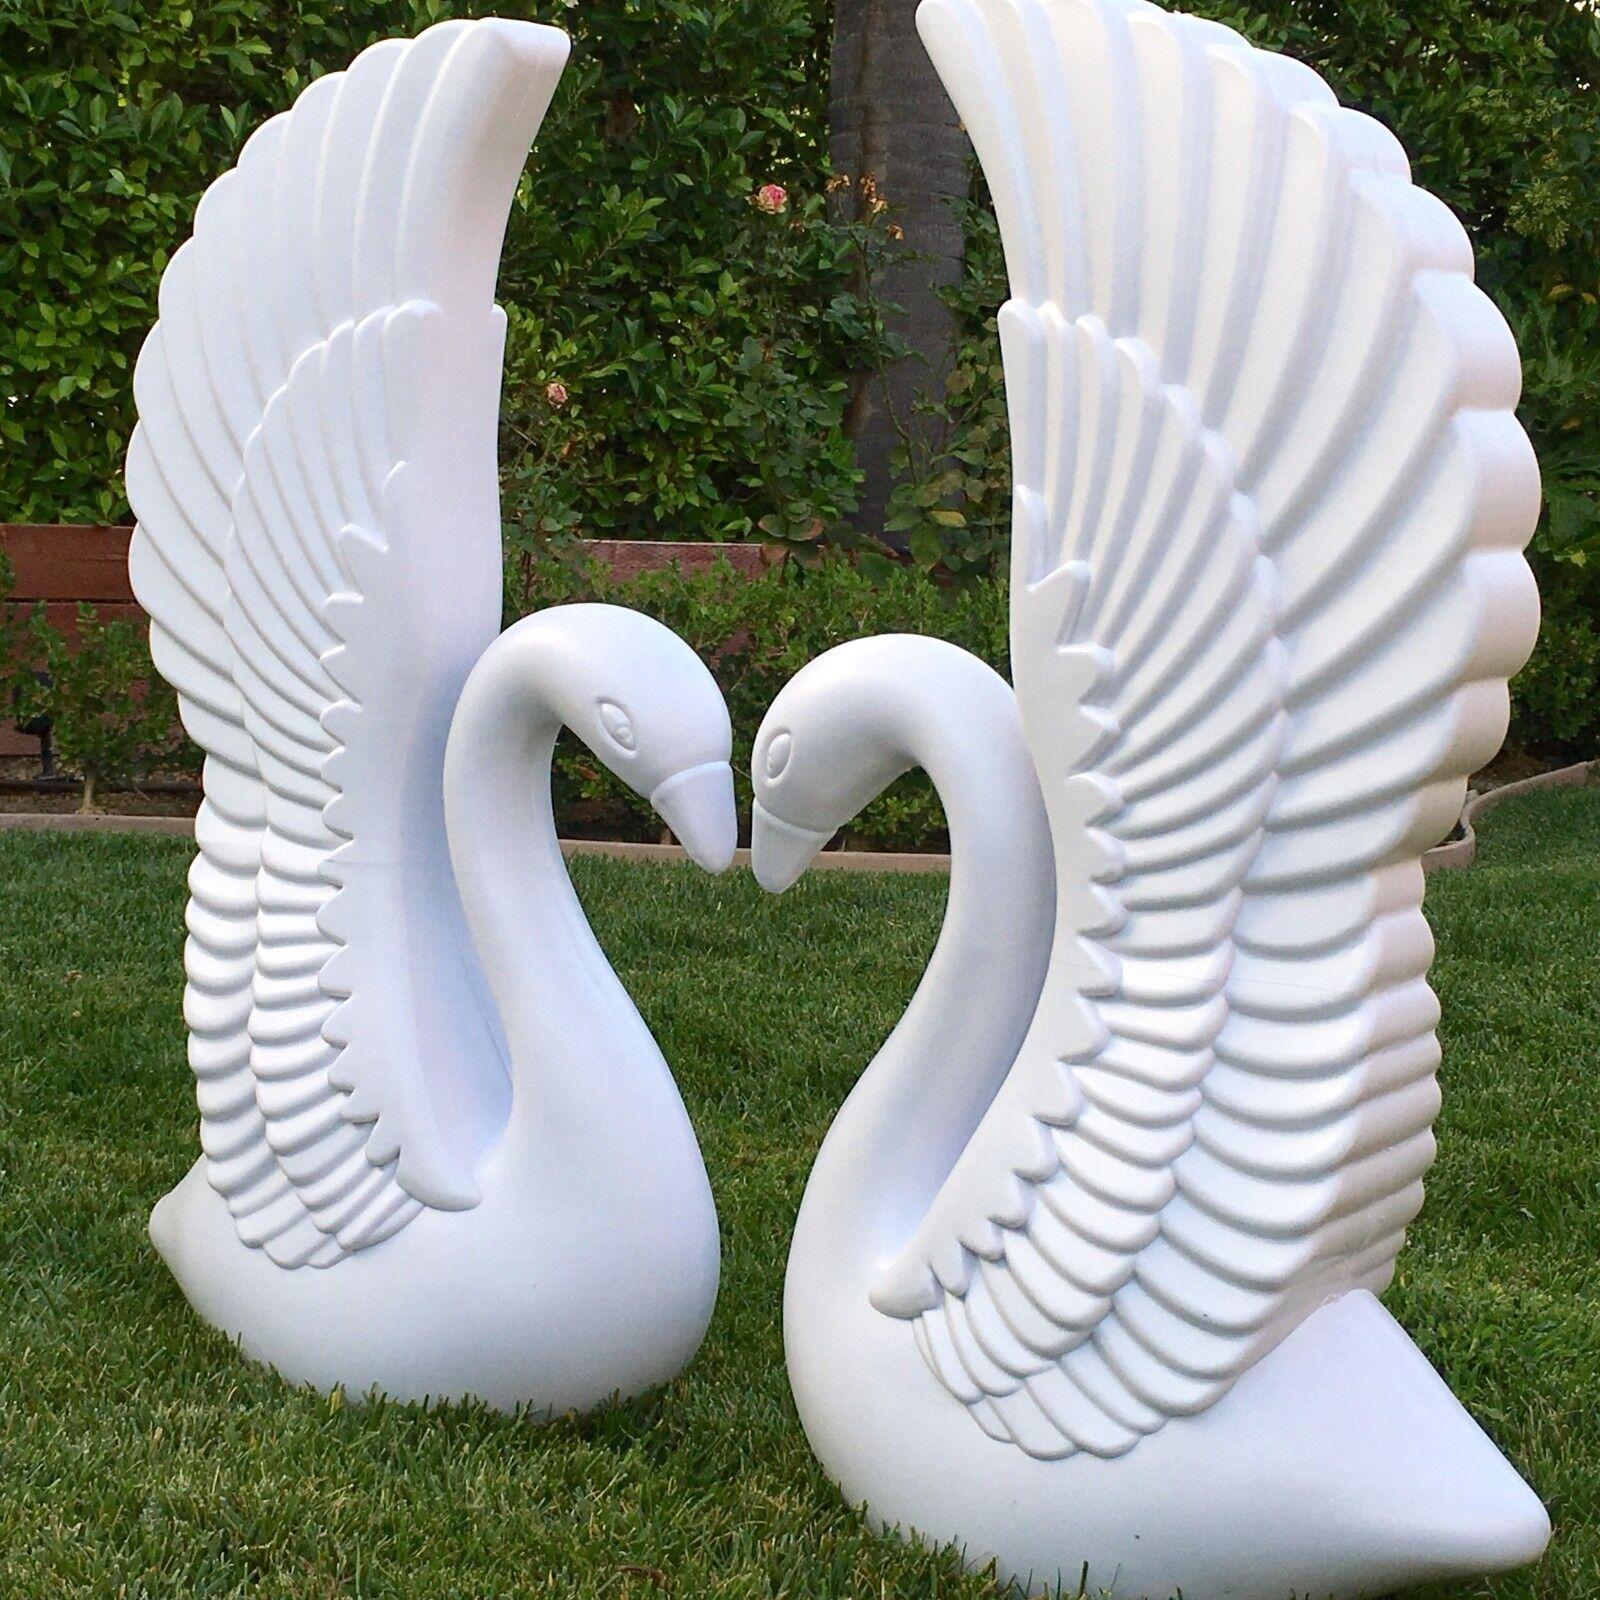 Elegant Weiß Plastic Swans and Roman Wedding Columns Garden Decorative Prop Set